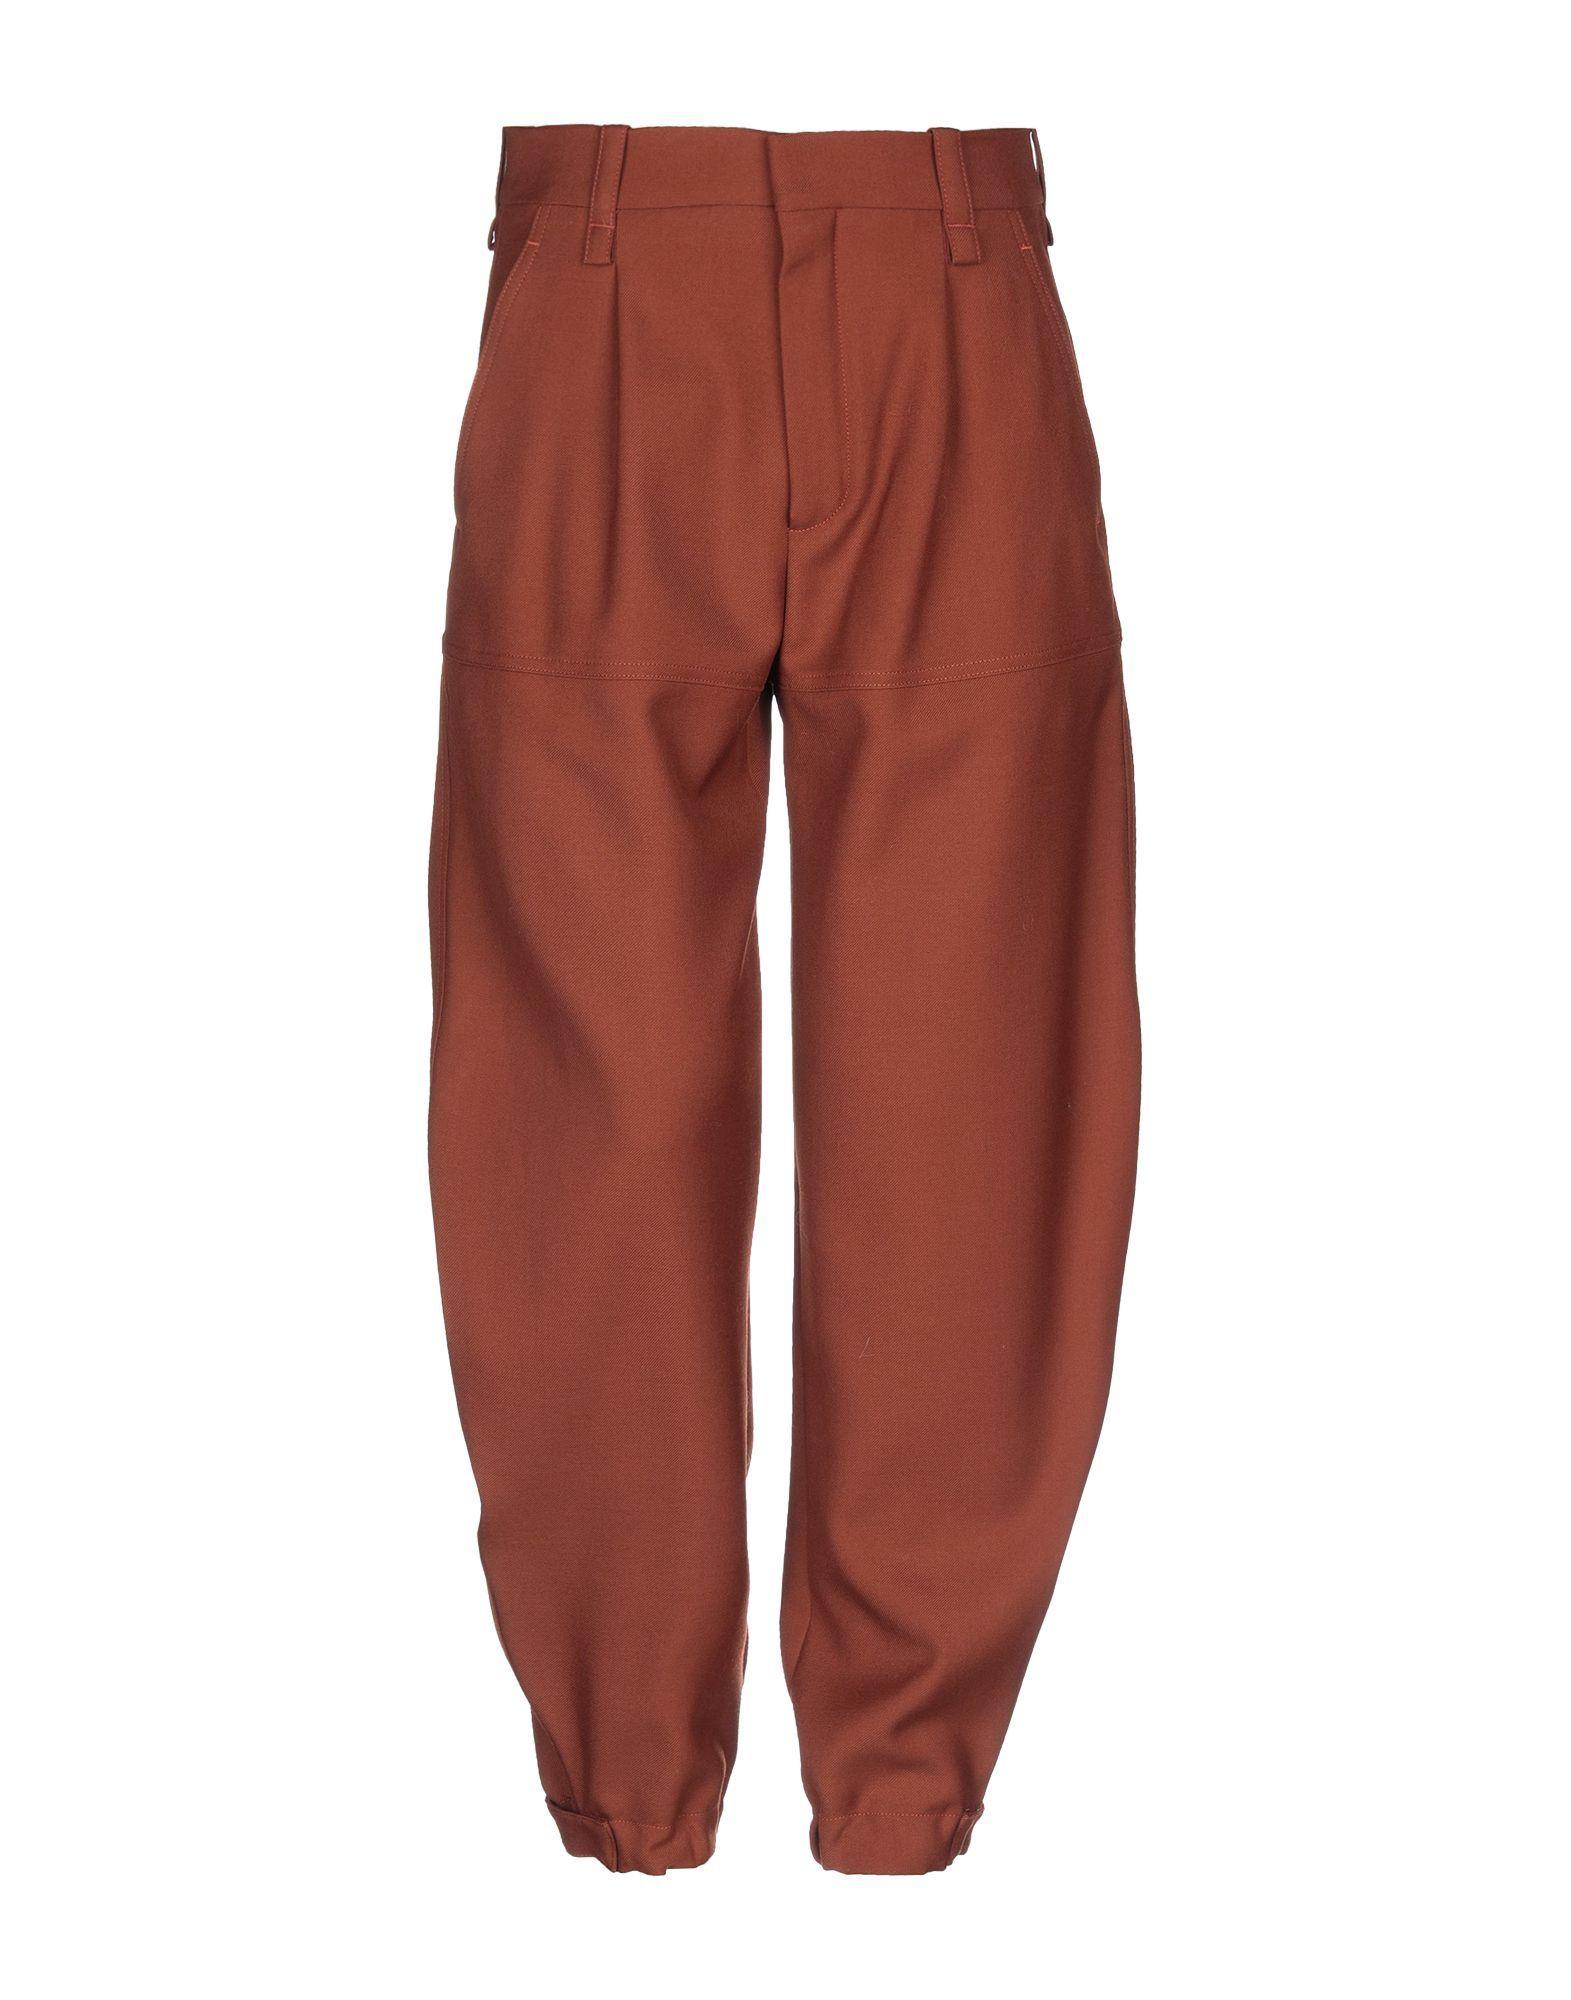 5c547f052477 Chloé Casual Trouser - Women Chloé Casual Trousers online on YOOX United  Kingdom - 13305345XA